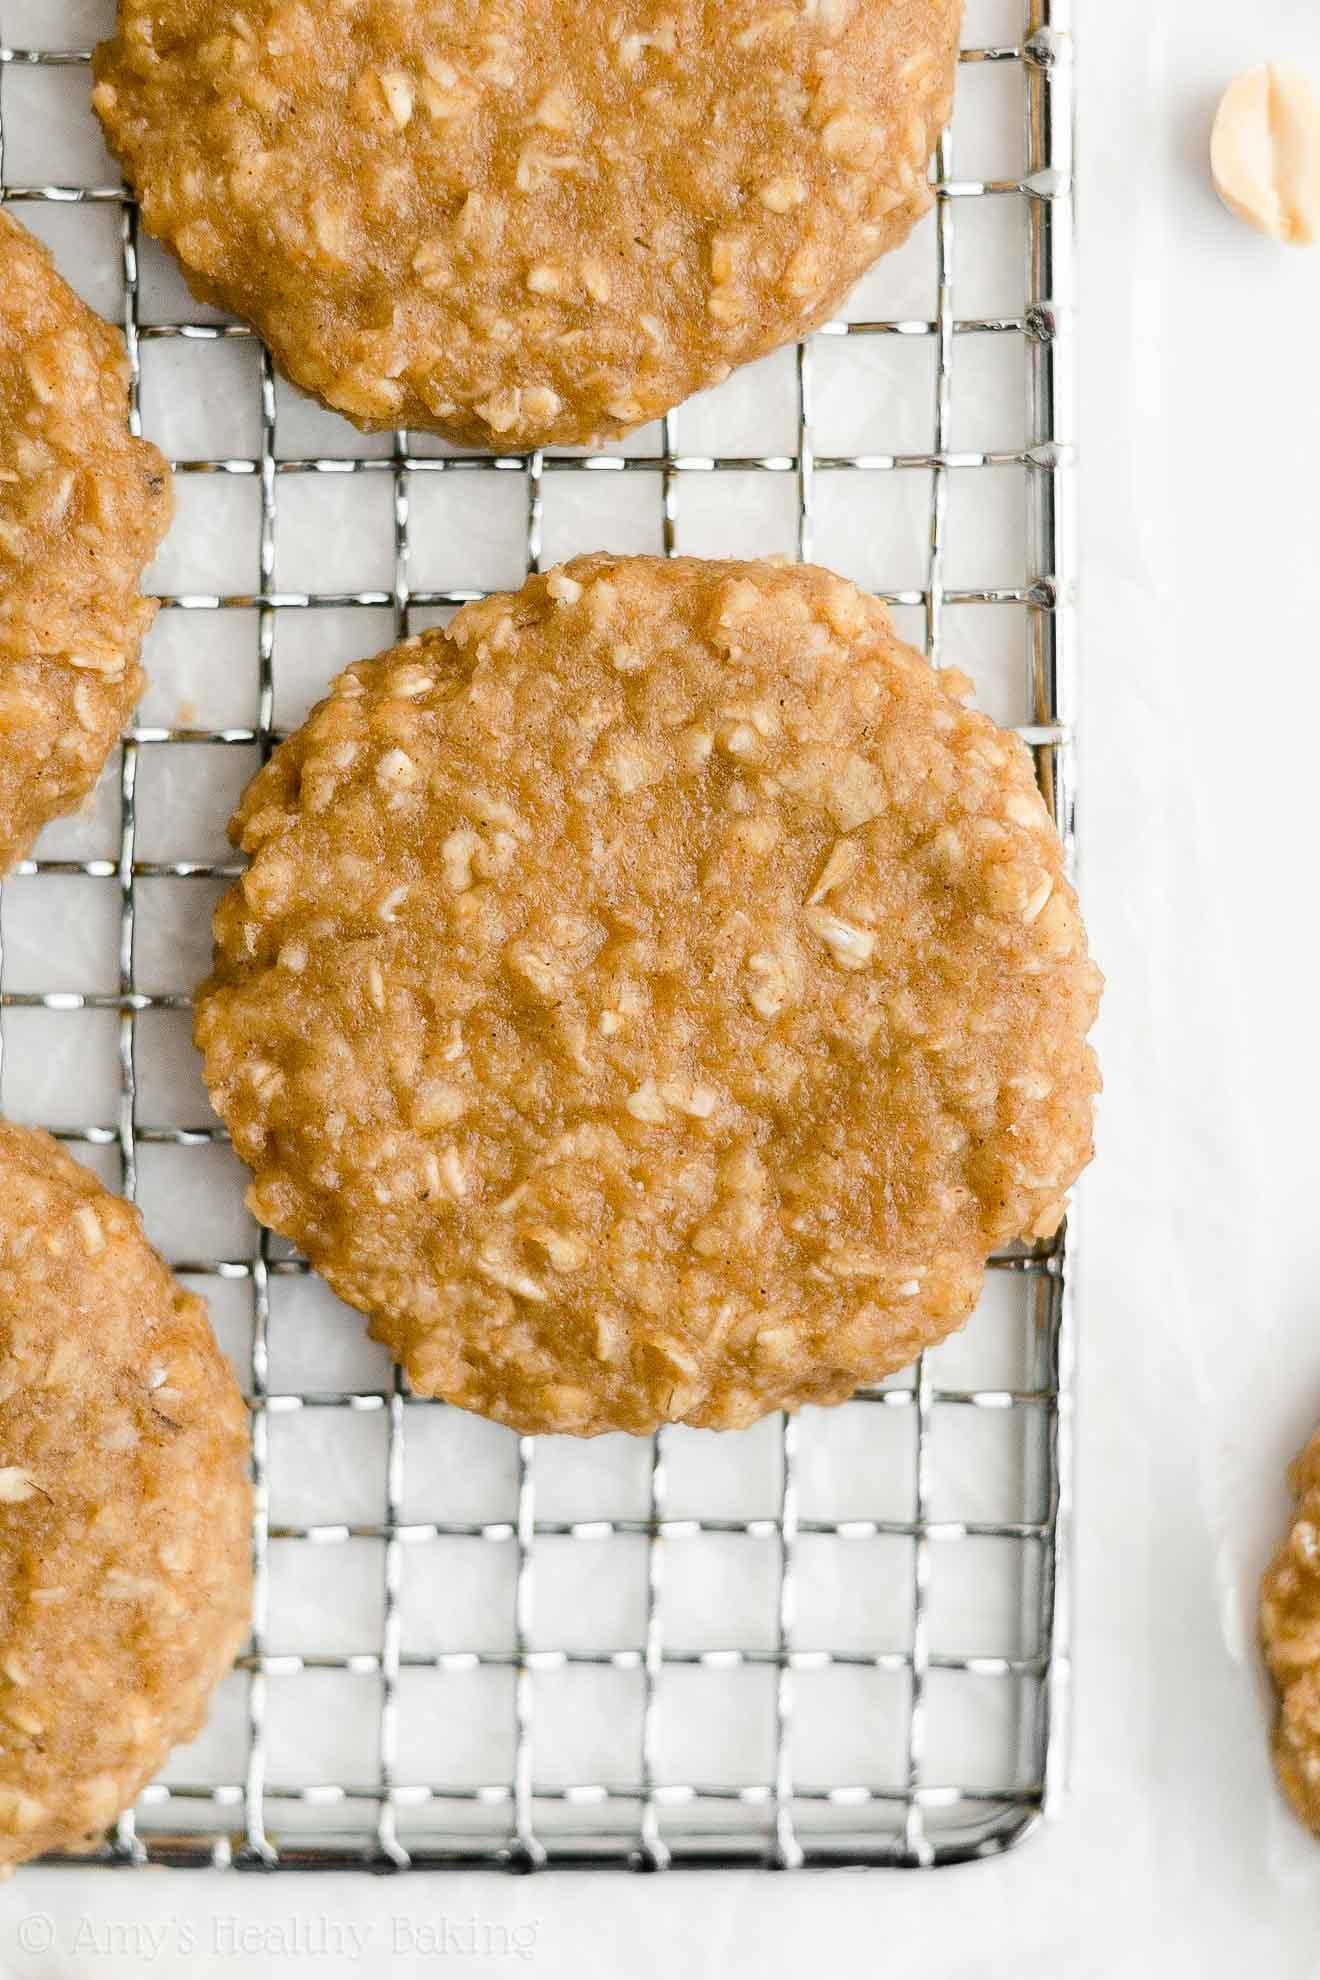 Best Easy Healthy Gluten Free Vegan Flourless Peanut Butter Breakfast Cookies